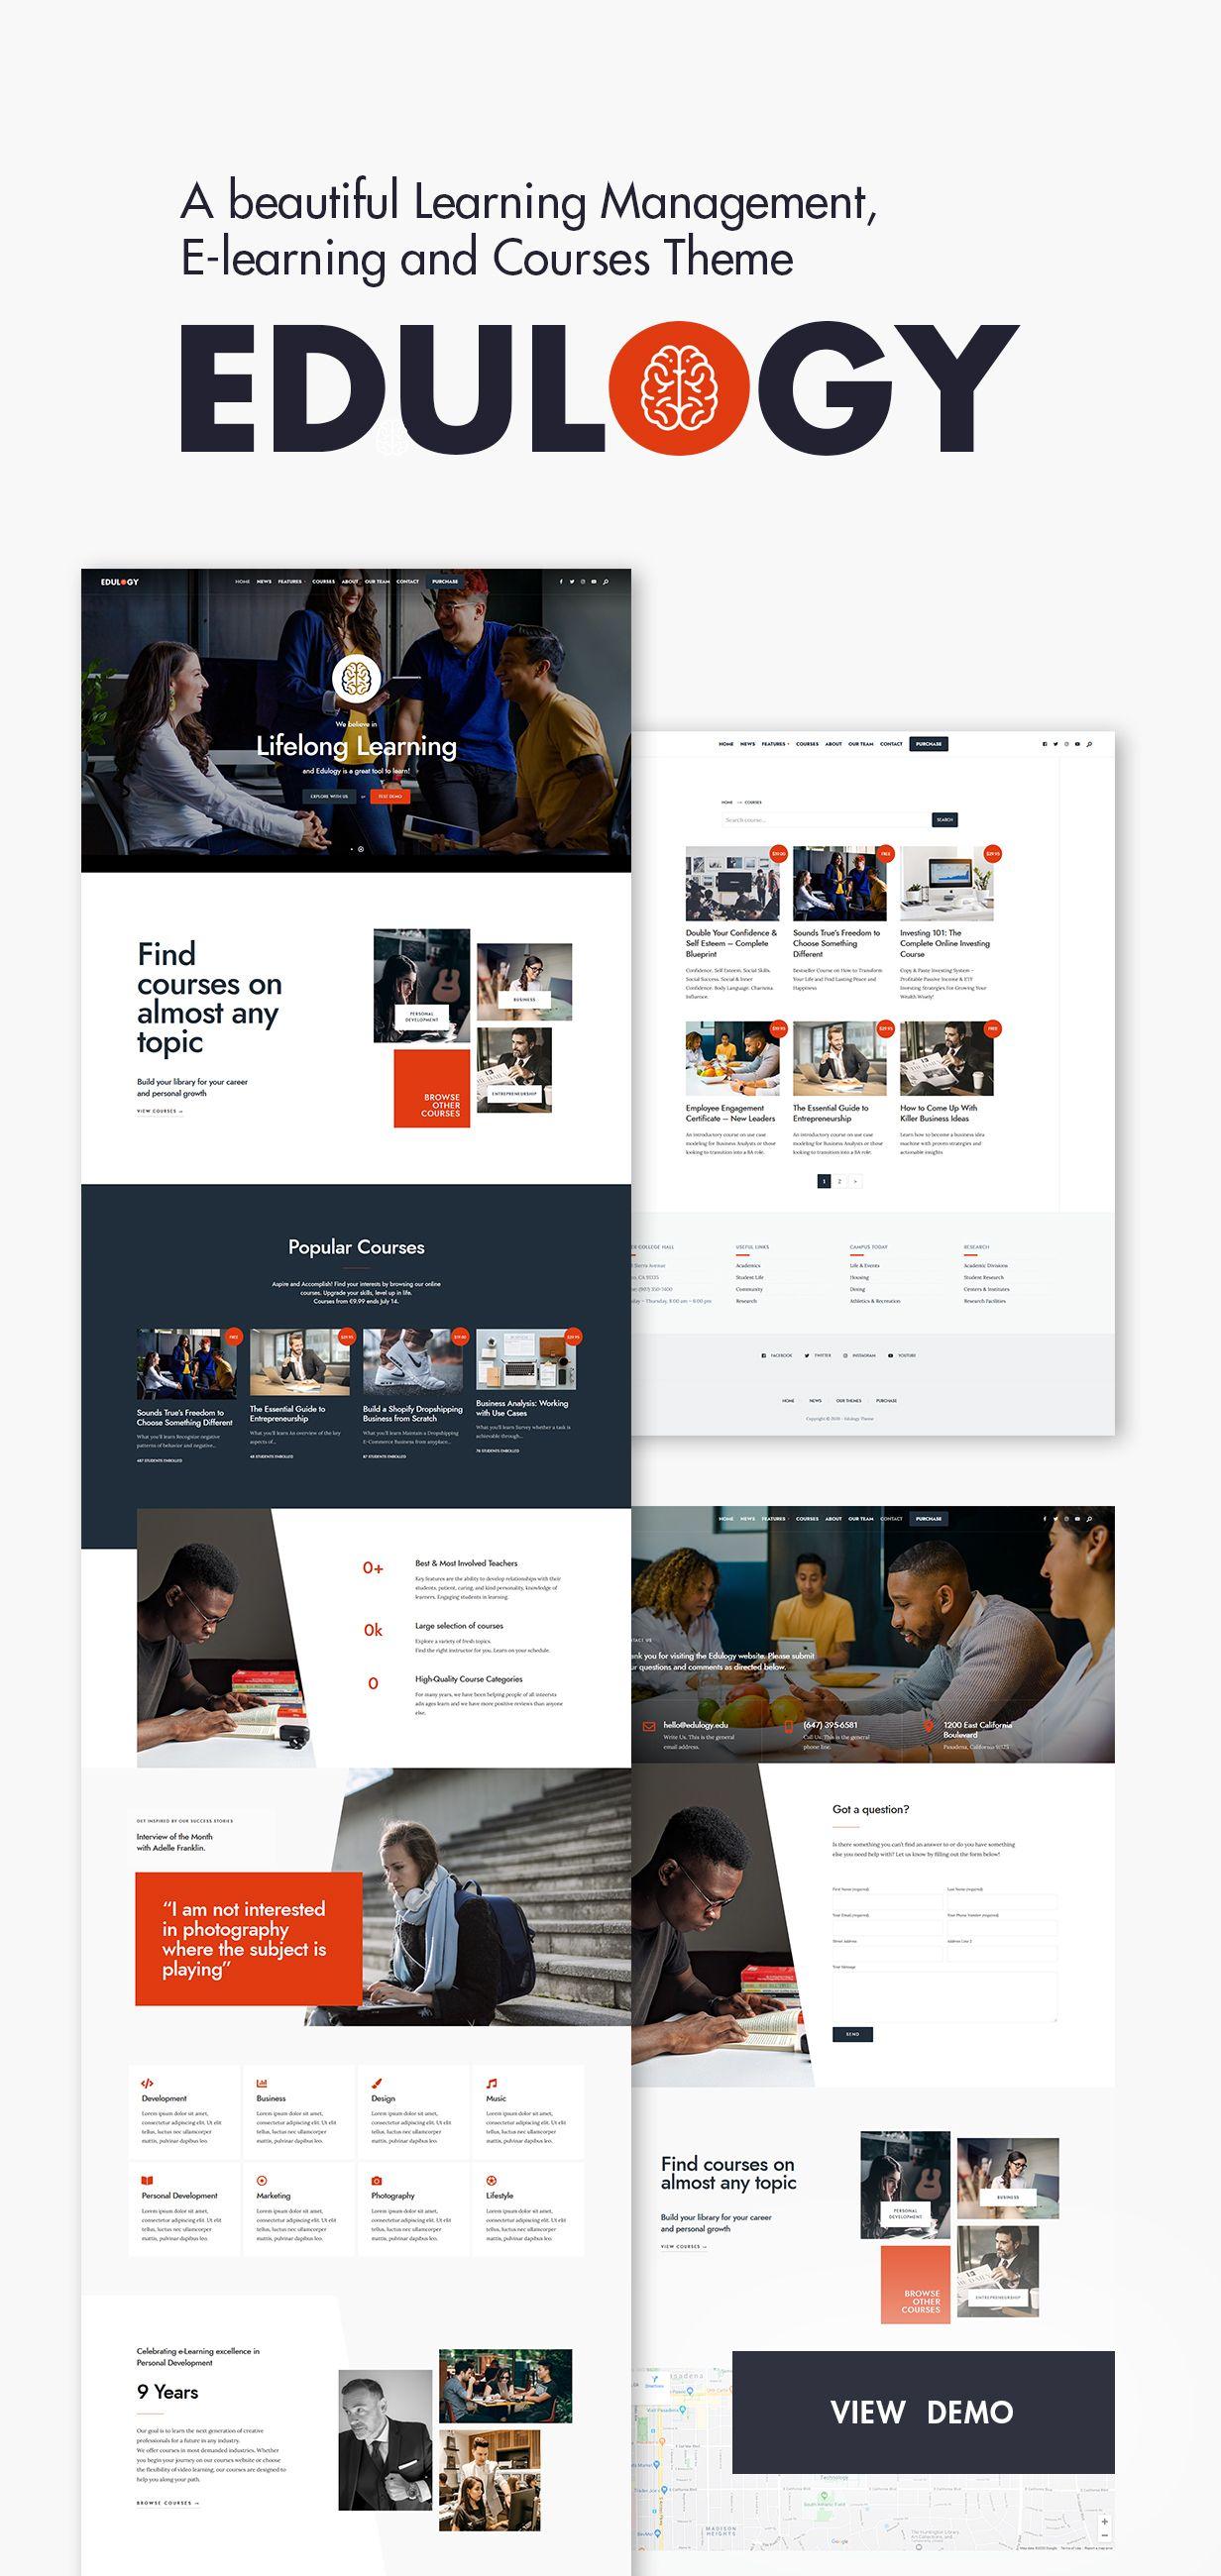 Edulogy E Learning And Courses Theme Ad Learning Paid Edulogy Theme Courses In 2020 Elearning Design Learning Website Design Elearning Design Inspiration